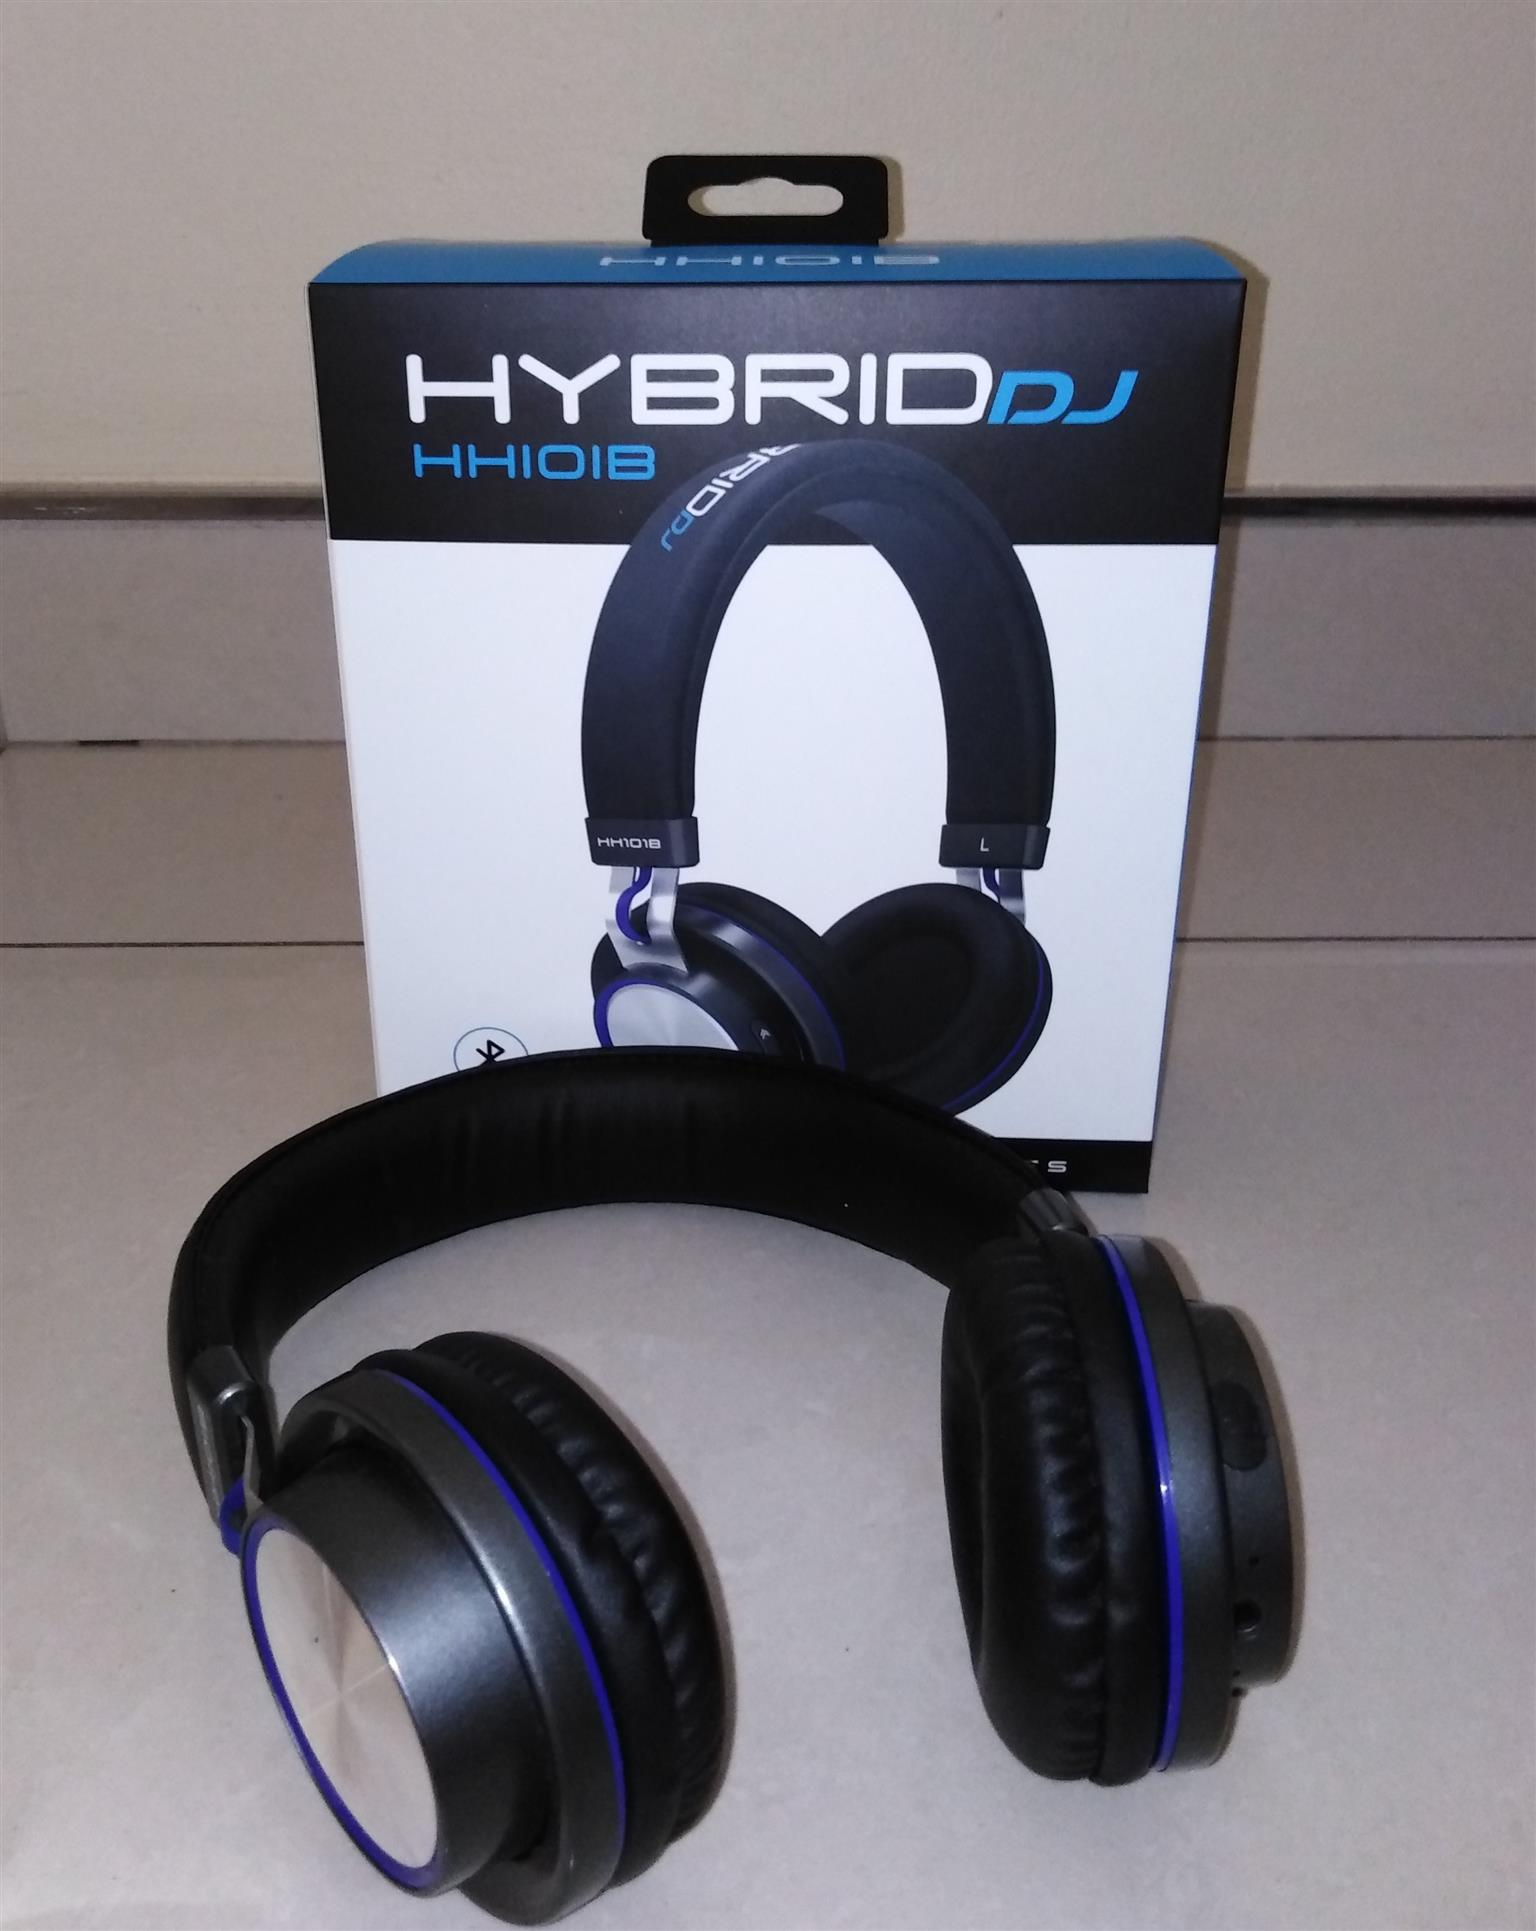 Hybrid DJ Headphones HH101B